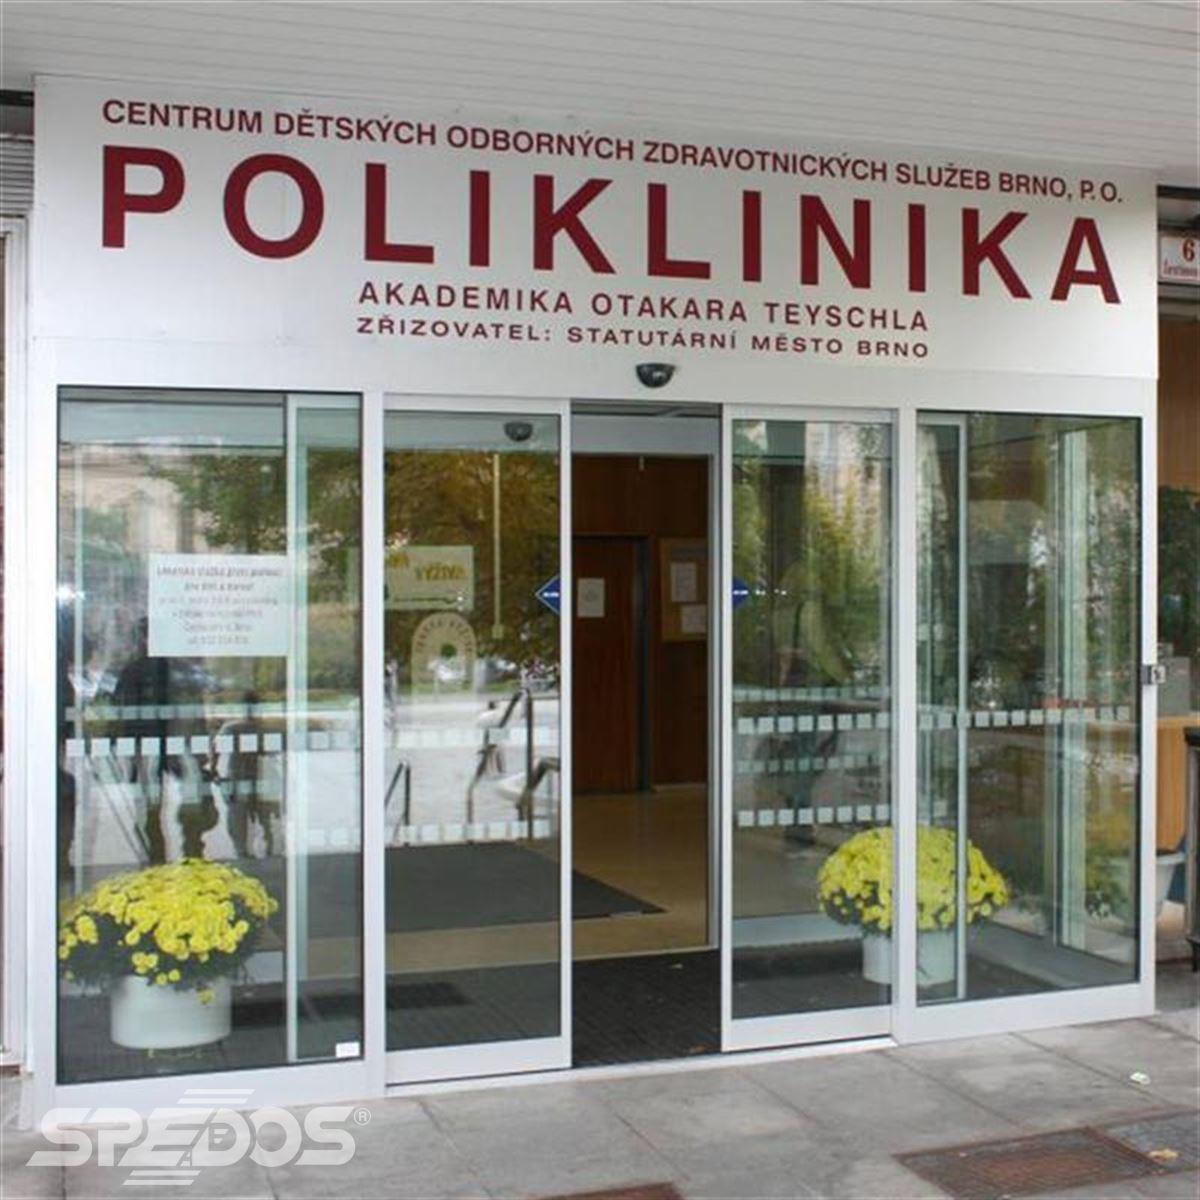 Posuvné automatické dveře v poliklinice